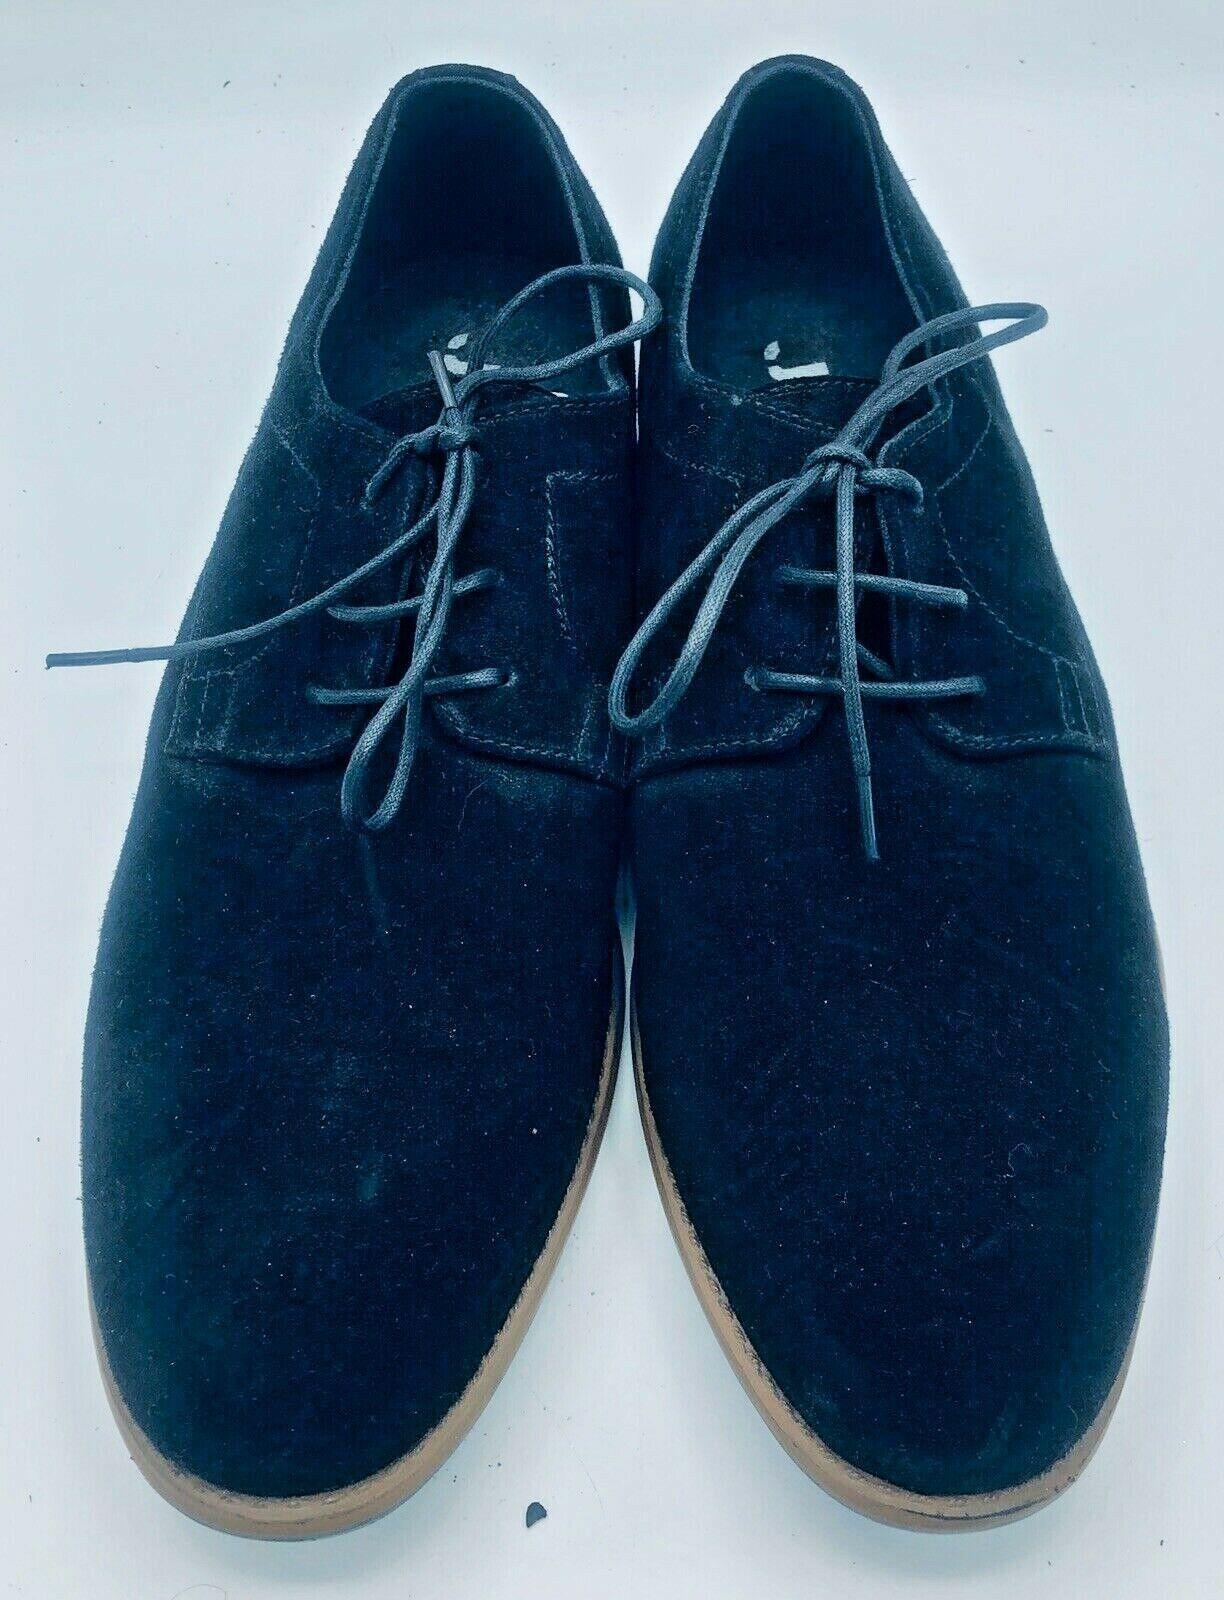 J75 by Jump Marconi Men's Classic Oxford Shoe Deep Black Size 14 Suede Lace Up